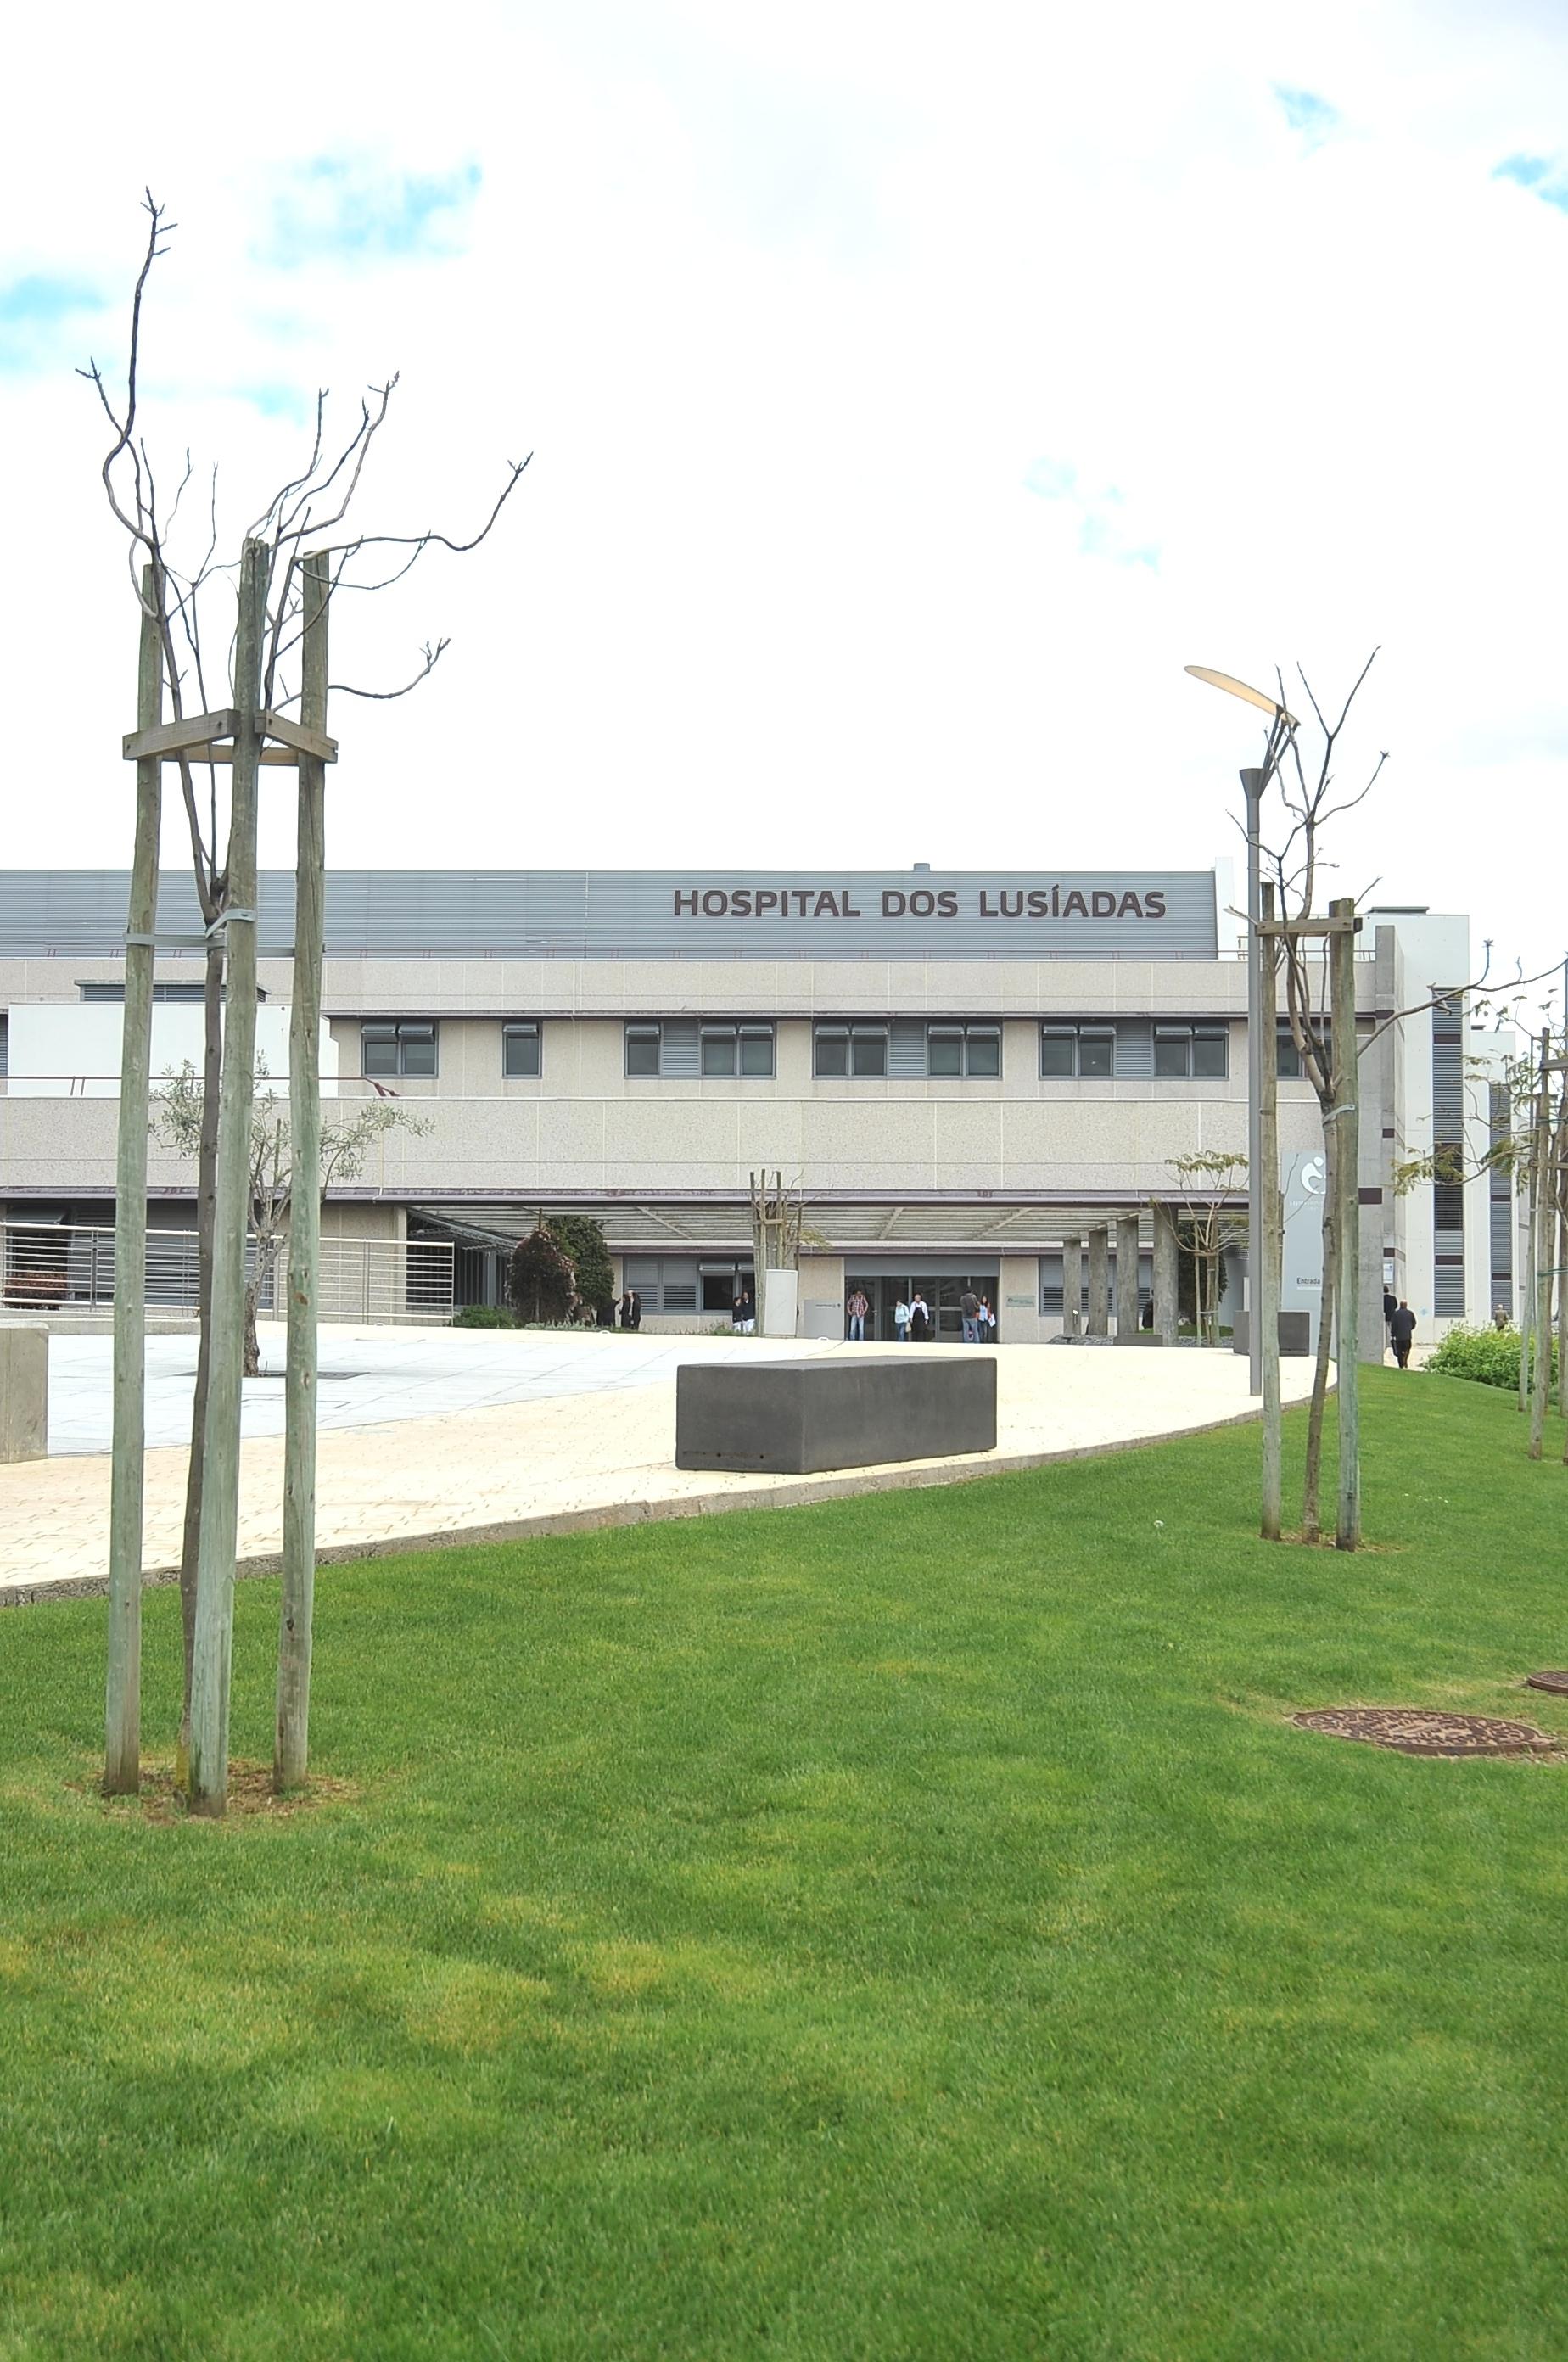 Hospital dos Lusíadas, Lisbon